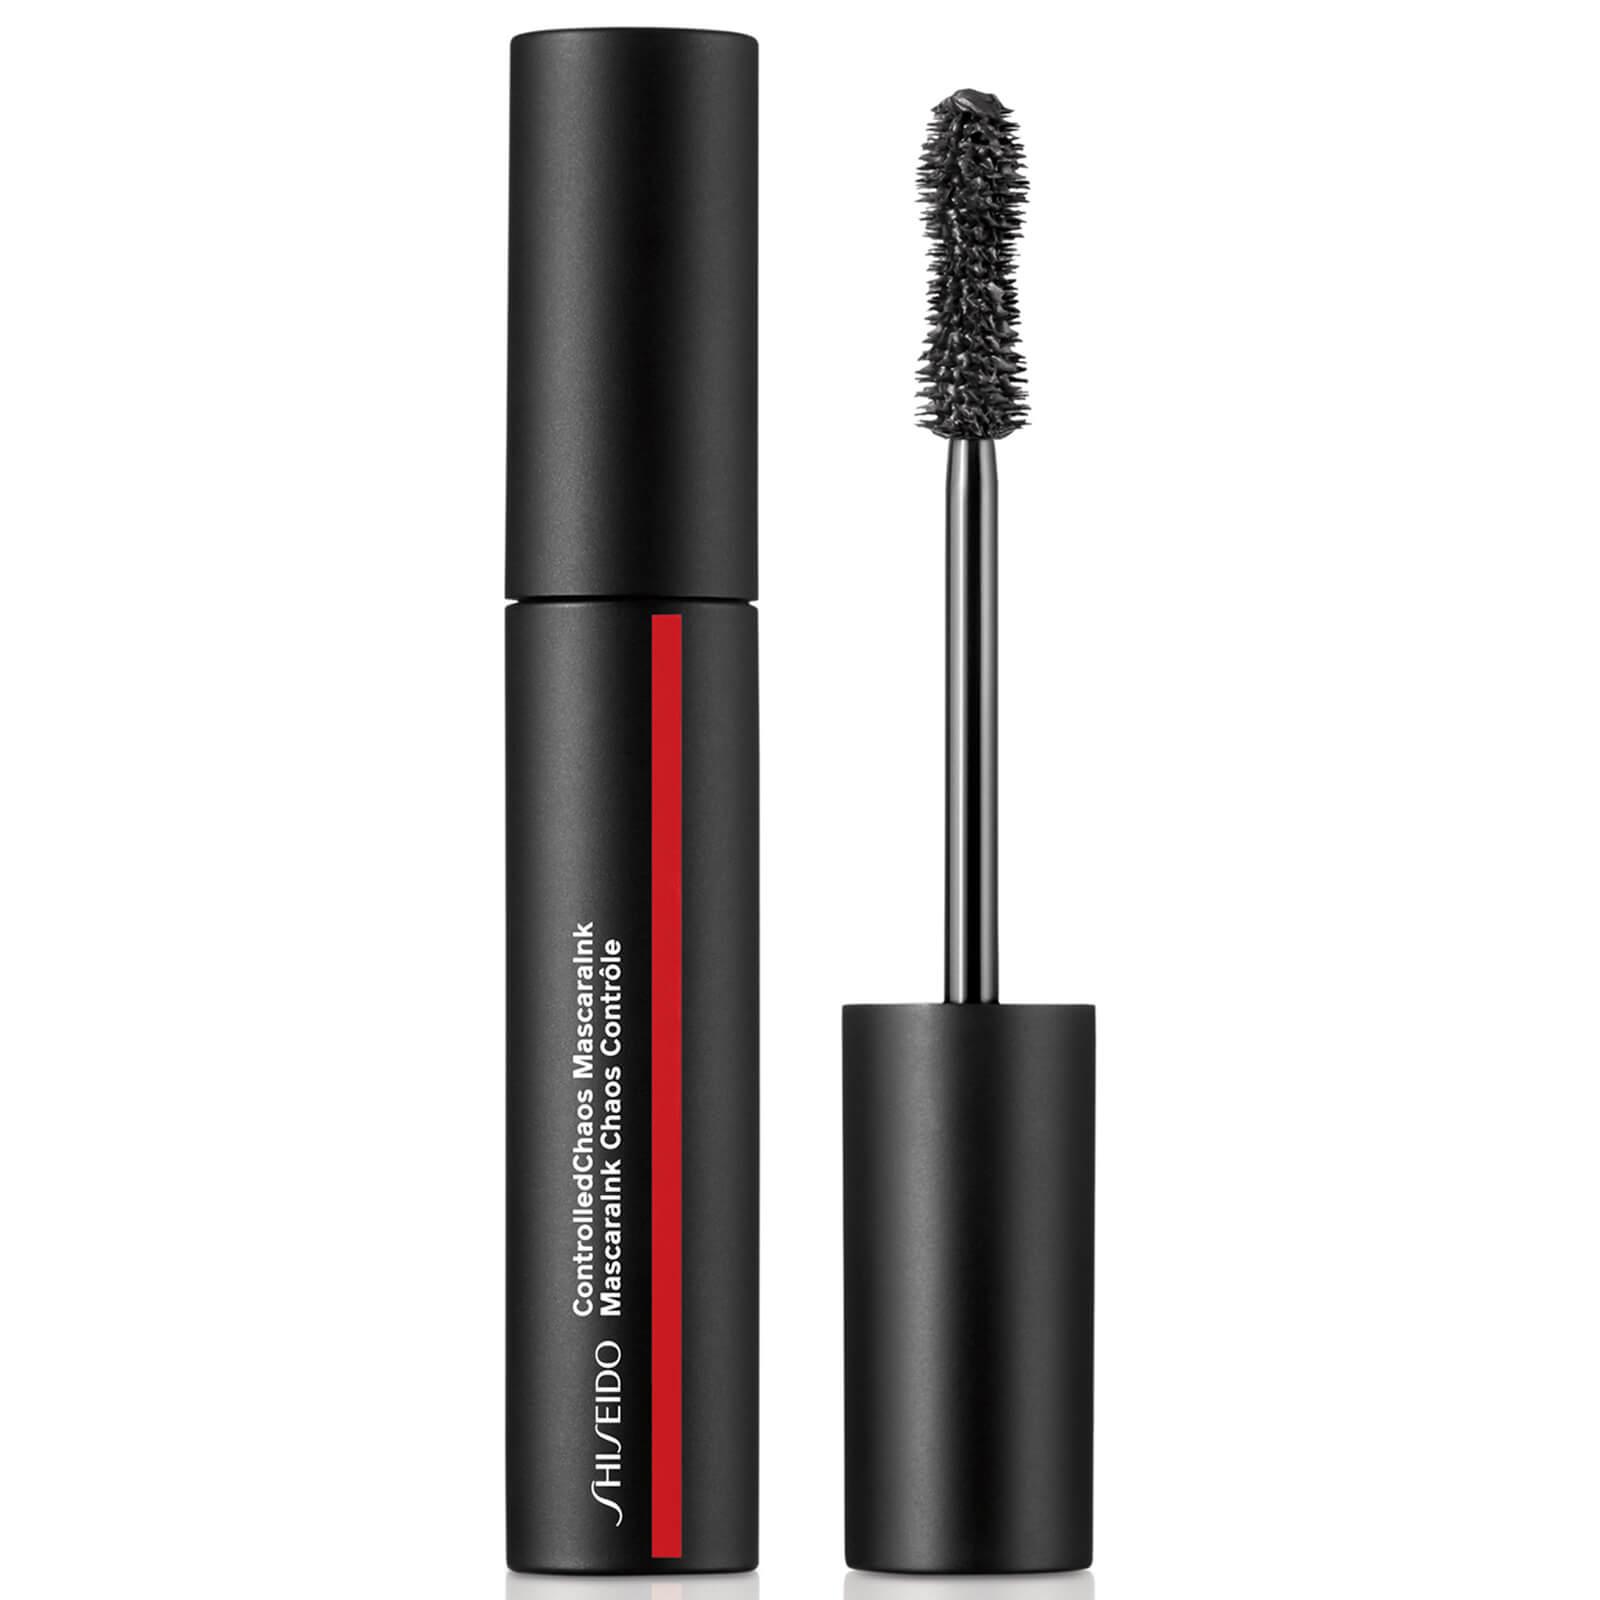 Shiseido Controlled Mascara